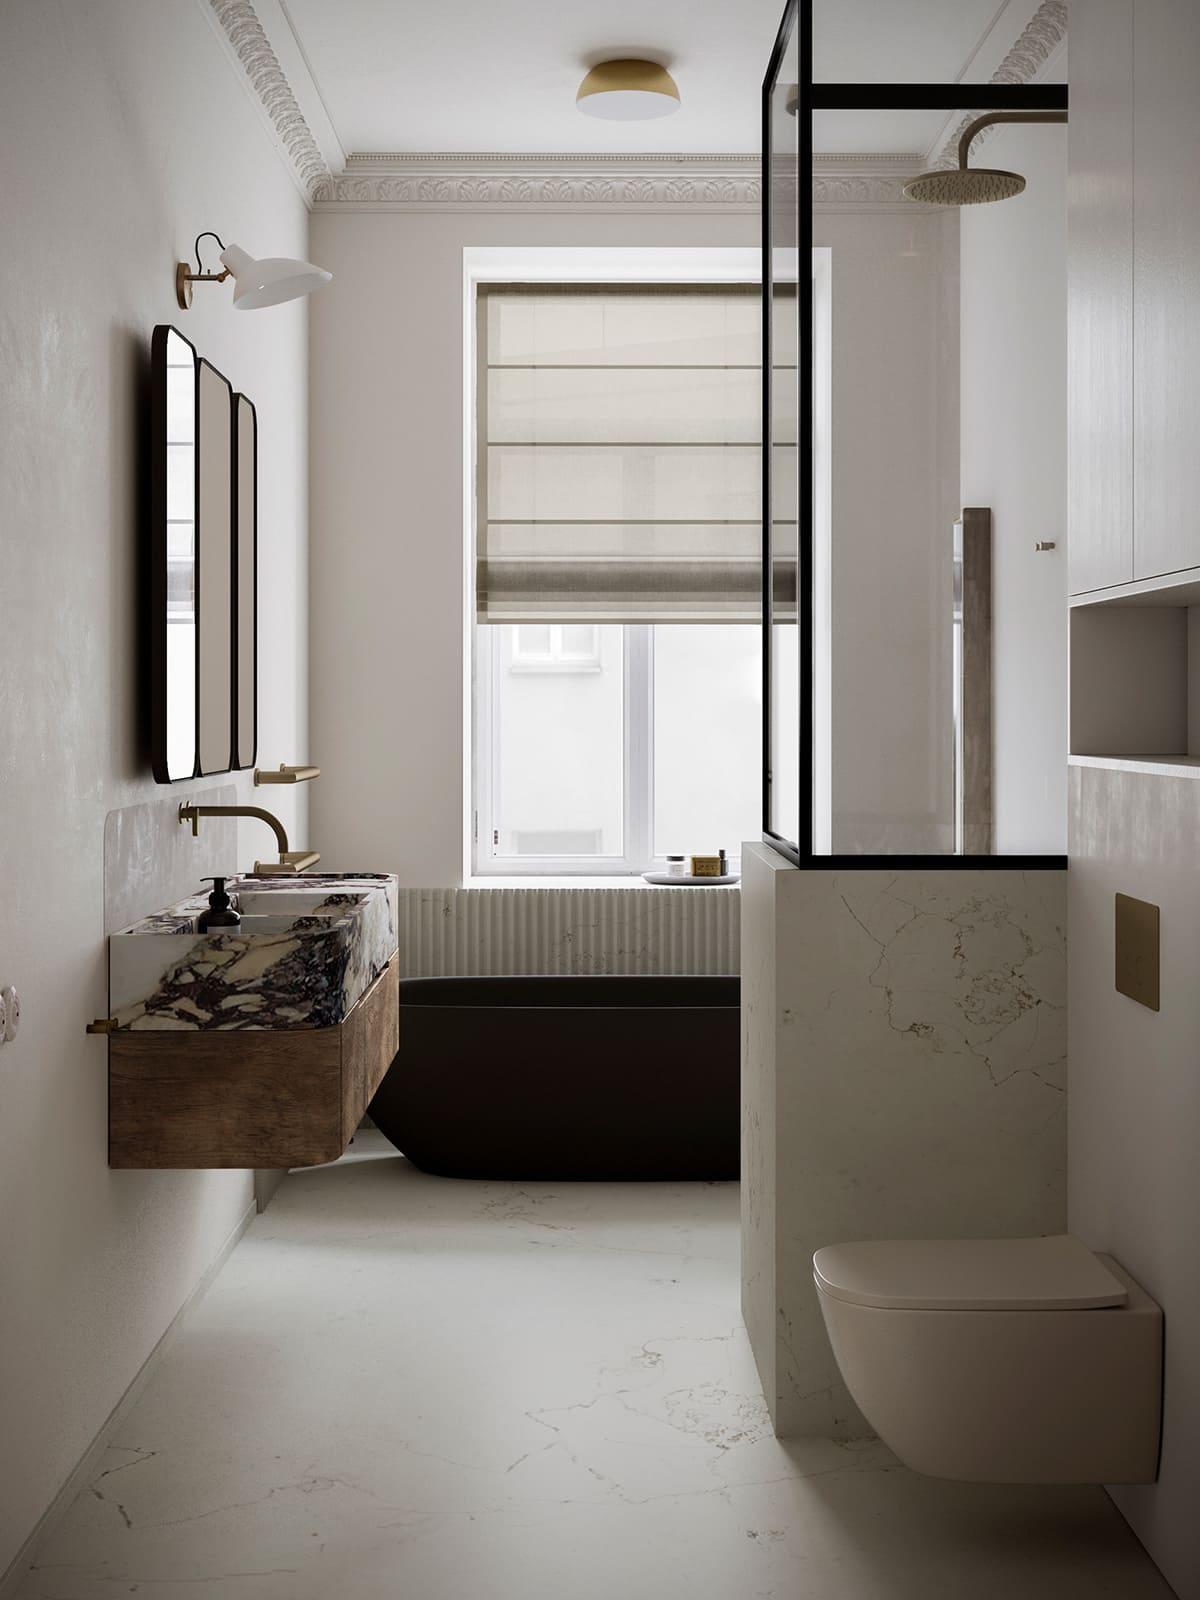 модный дизайн интерьера квартиры фото 21